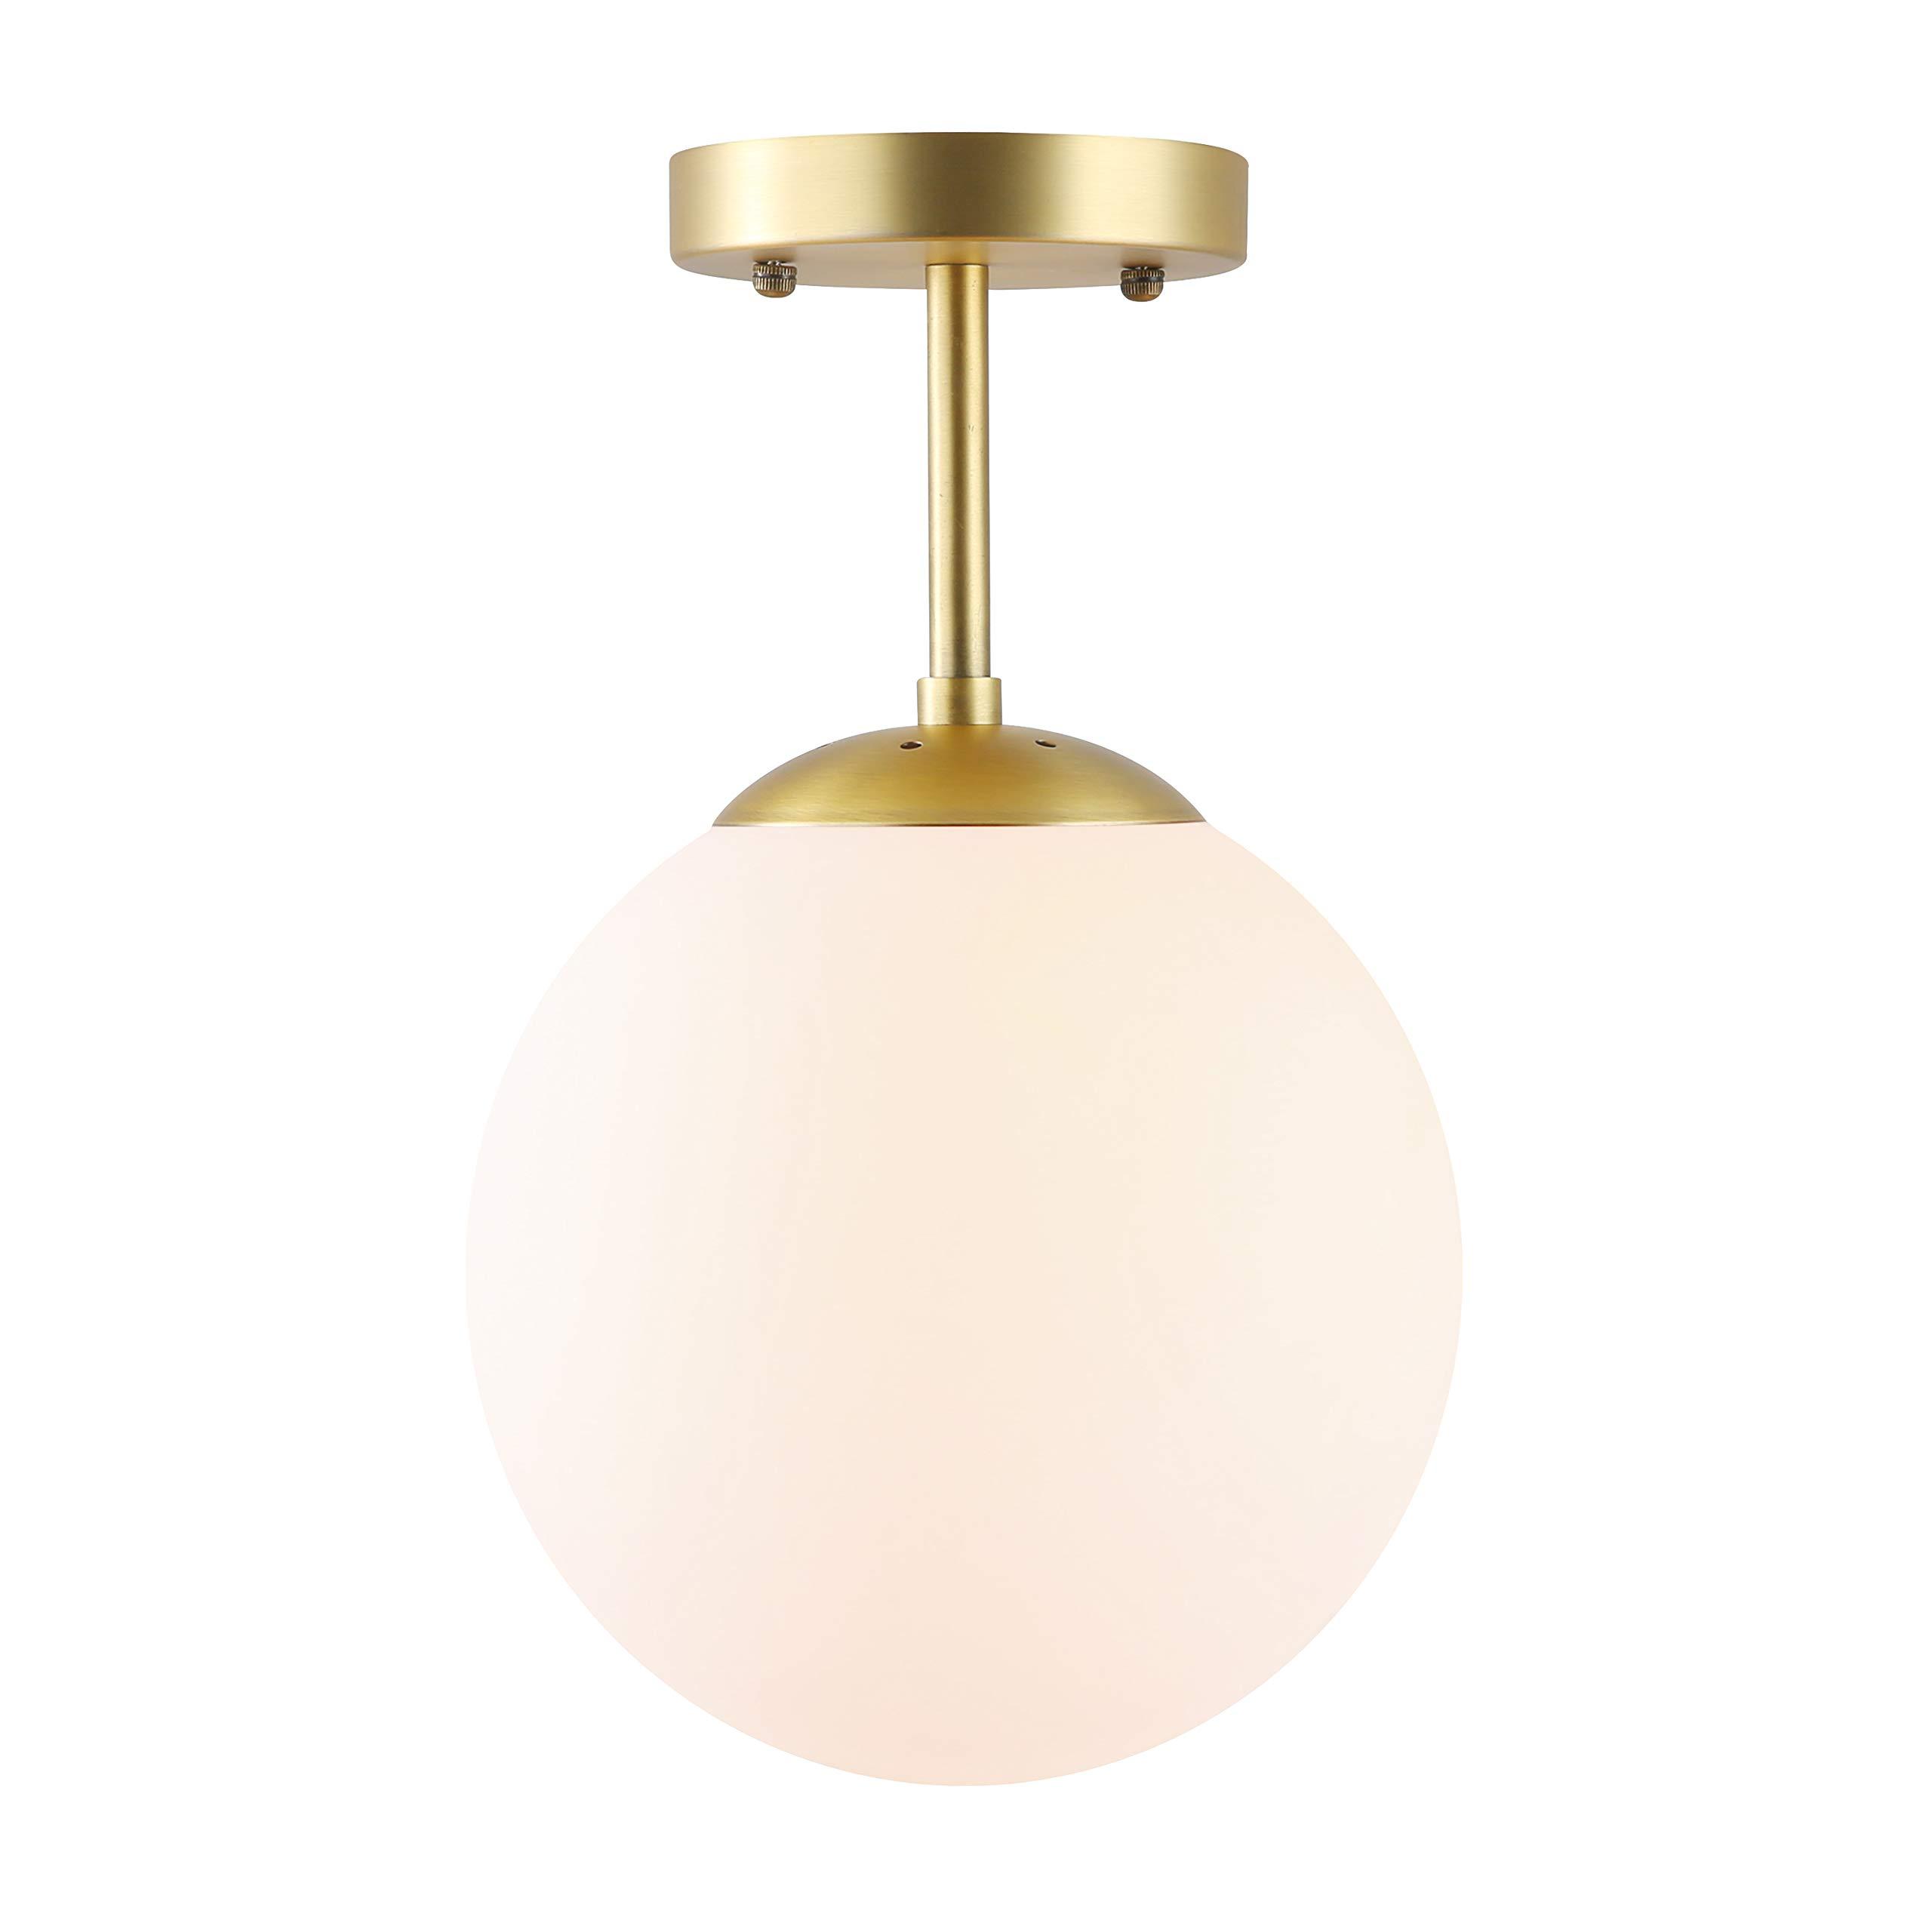 Light Society Tesler Globe Semi Flush Mount Ceiling Light, Matte White with Brass Finish, Contemporary Mid Century Modern Style Lighting Fixture (LS-C176-BRS-MLK)